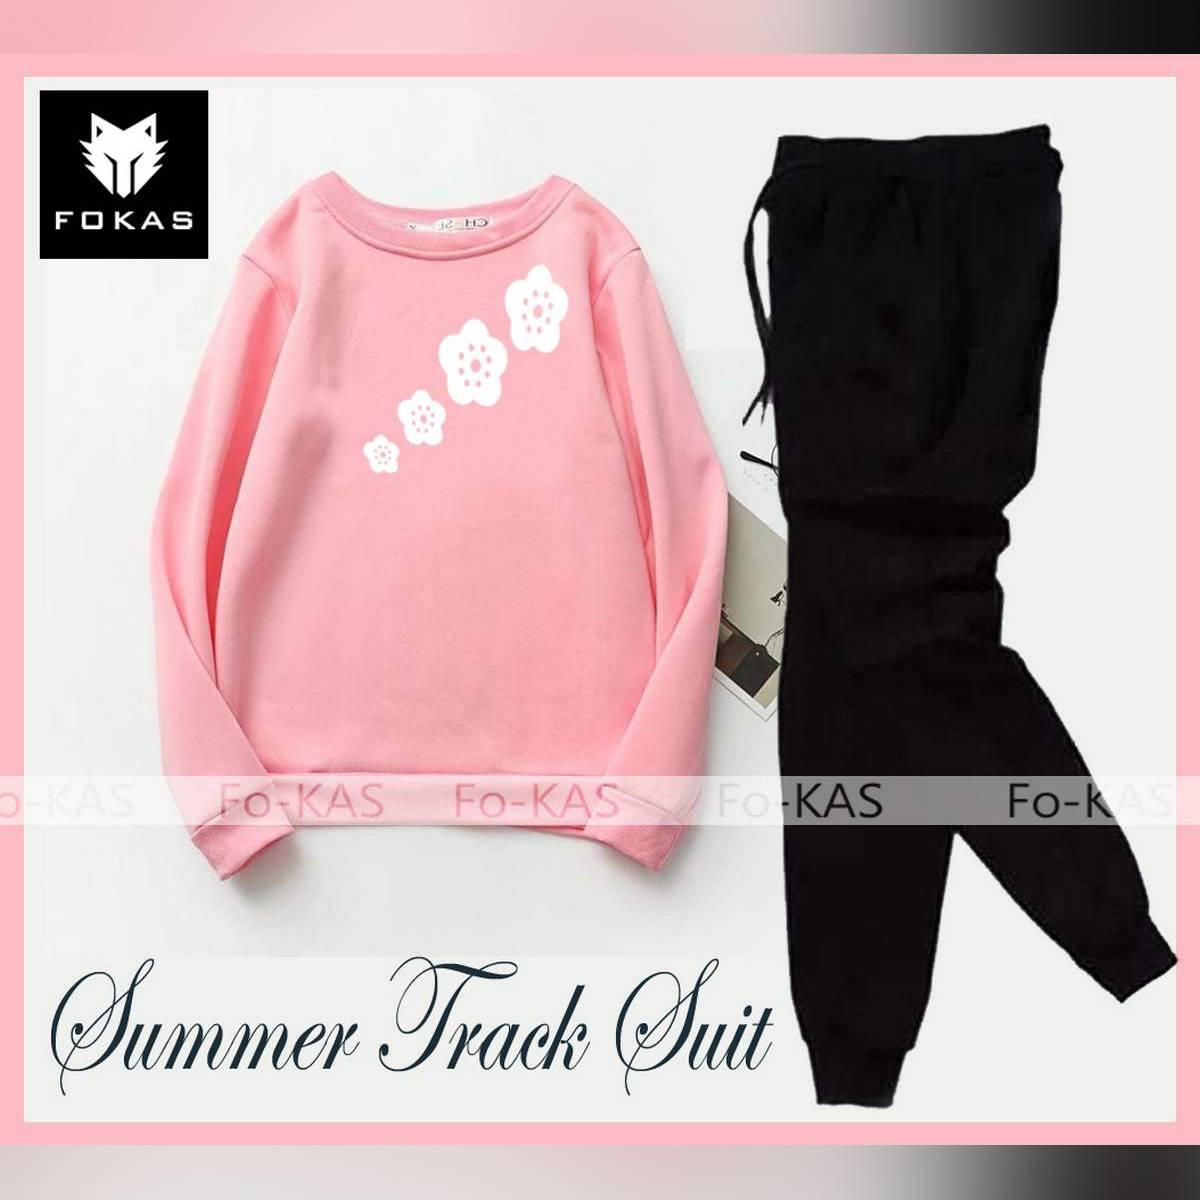 Flowers Printed Summer Track Suit Ribbed T-Shirt & Trouser Elegant Tracksuit for _Girls & _Women Trendy Wear